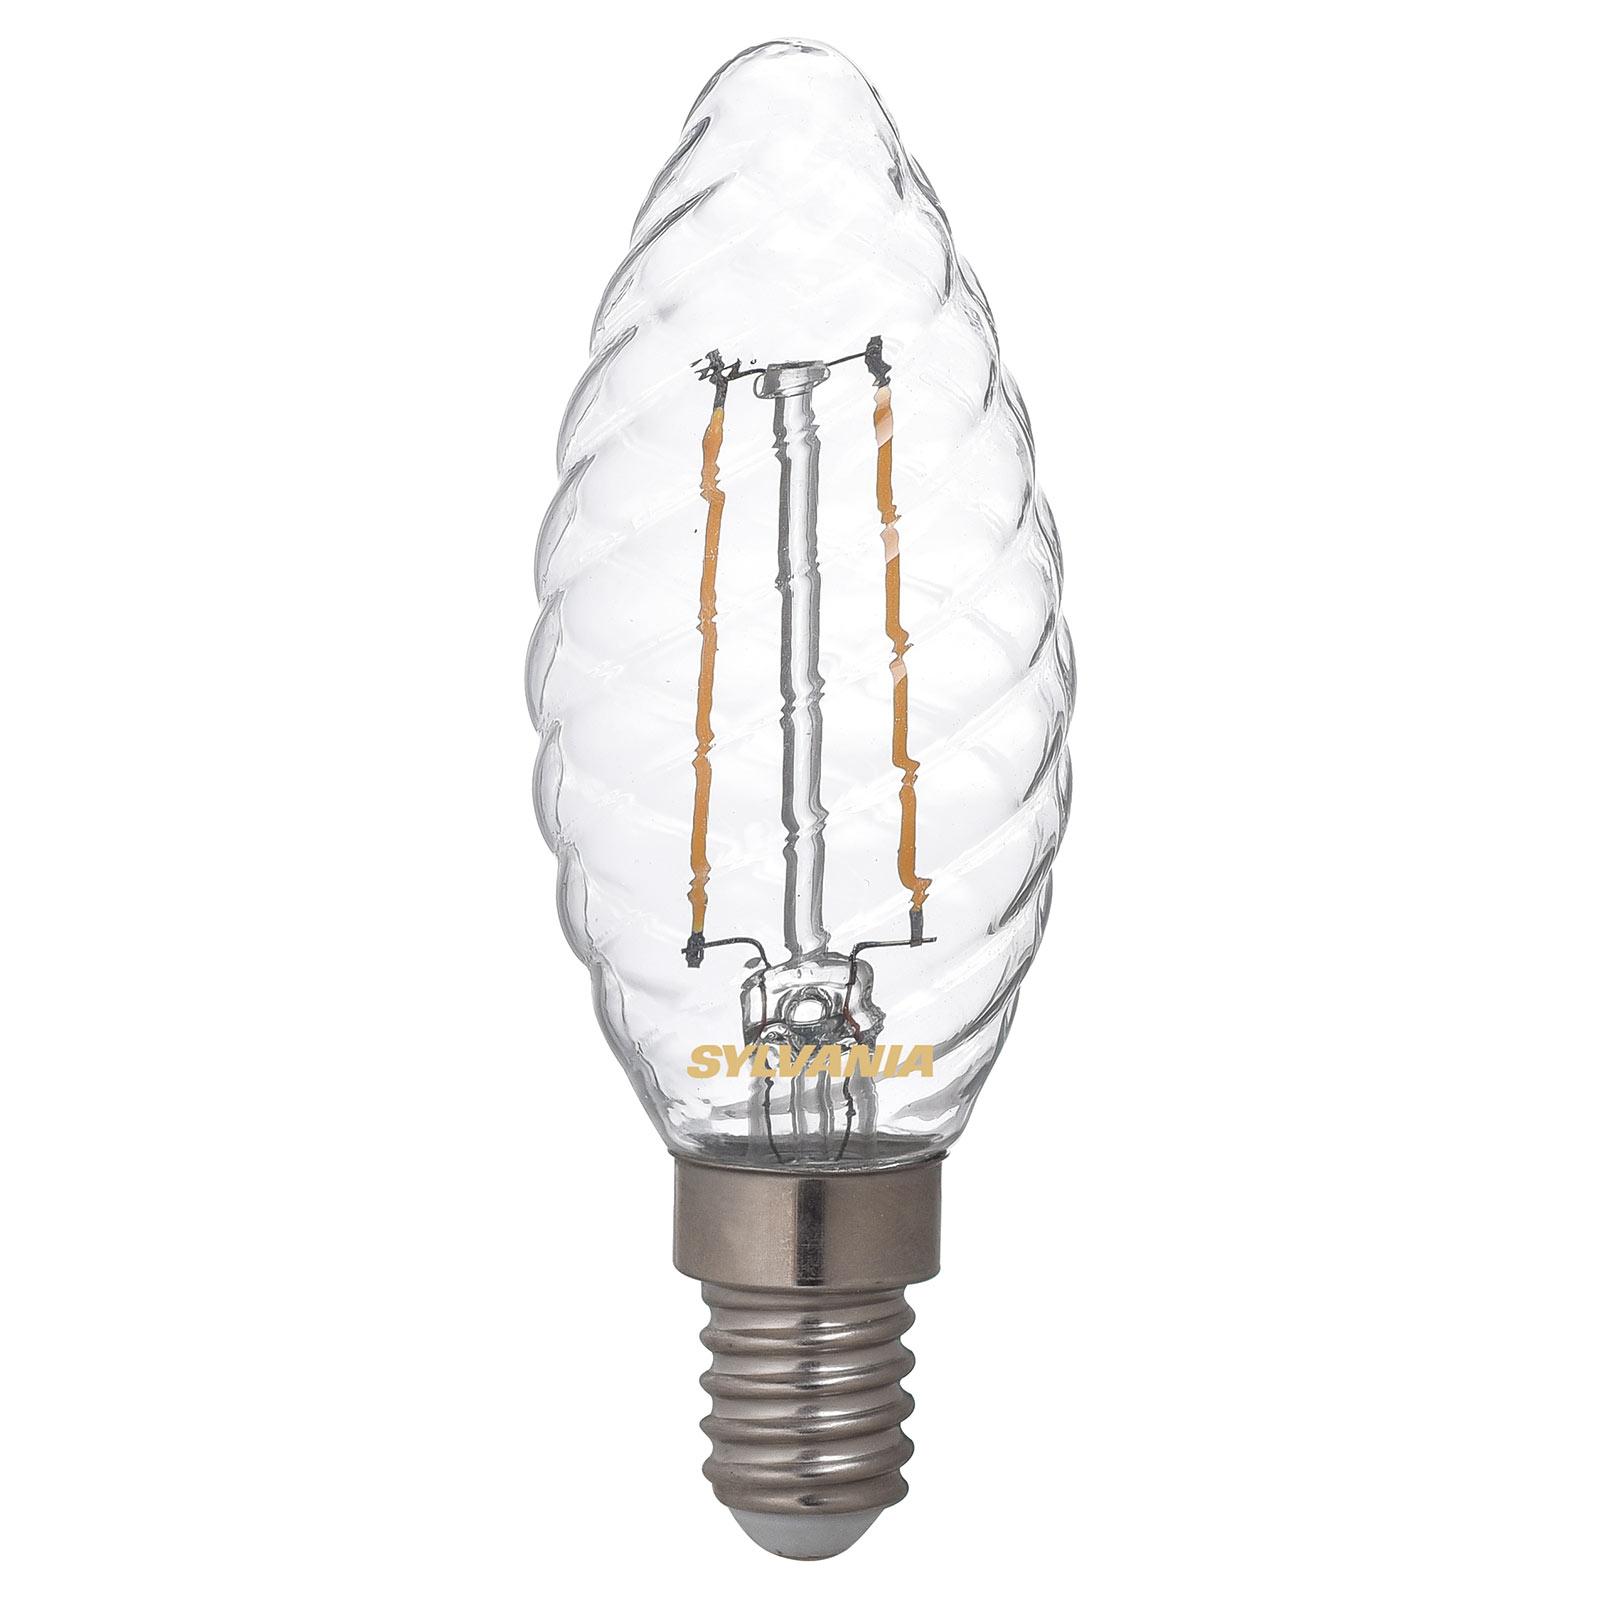 LED-Kerzenlampe E14 ToLEDo 2,5W 827 klar, gedreht